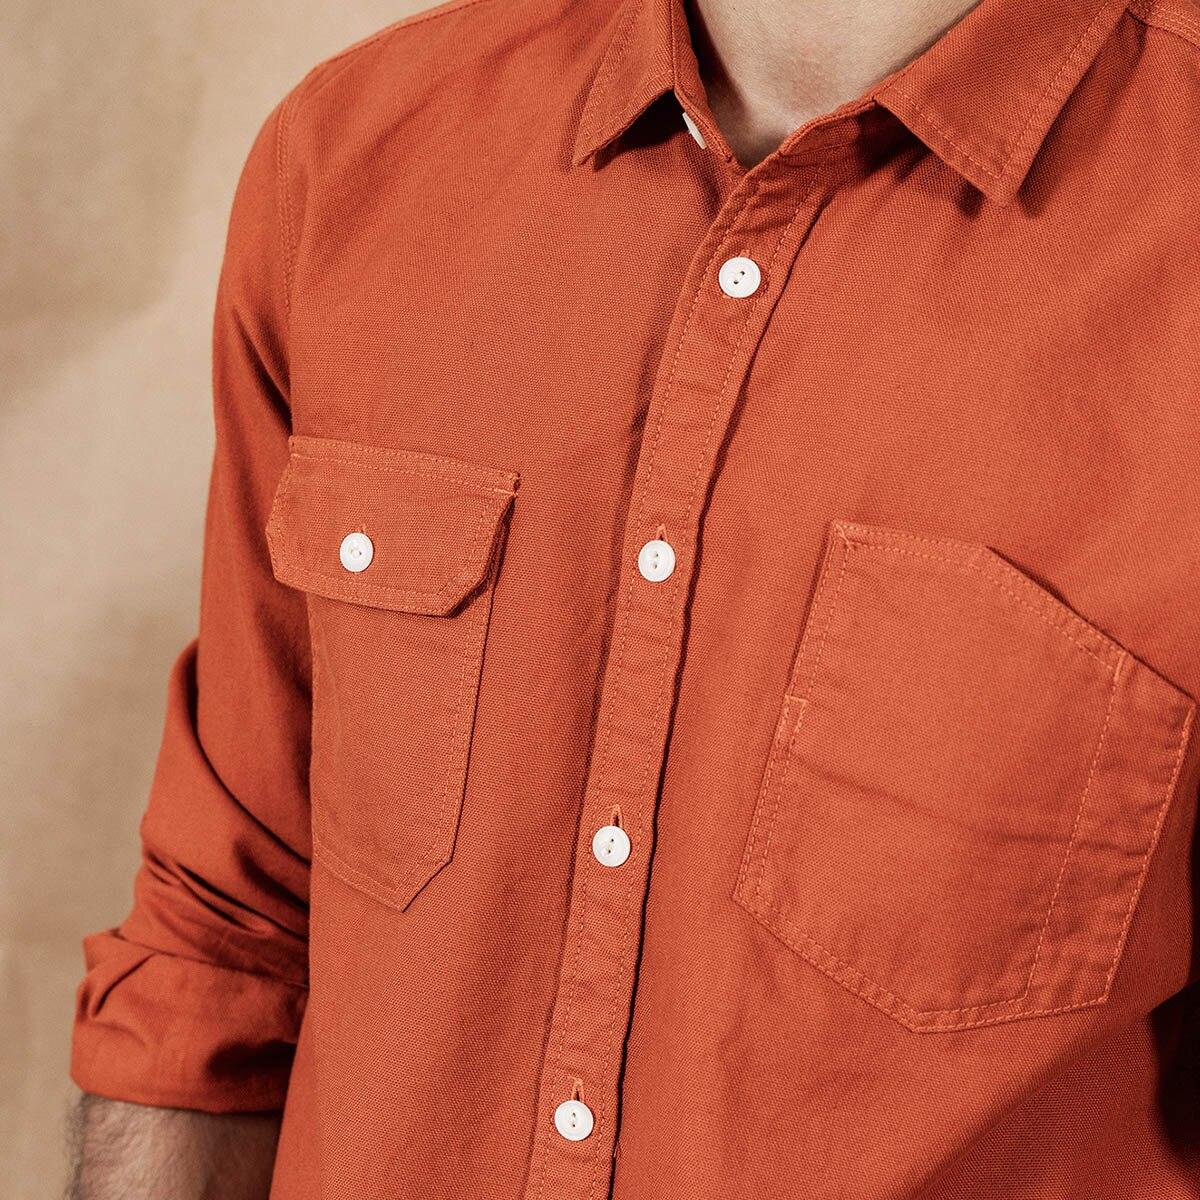 Image 4 - SIMWOOD 2020 spring New Cargo Pocket Shirt Men 100% Cotton Causal  Long Sleeve Shirts Plus Size High Quality Clothing 190376Casual  Shirts